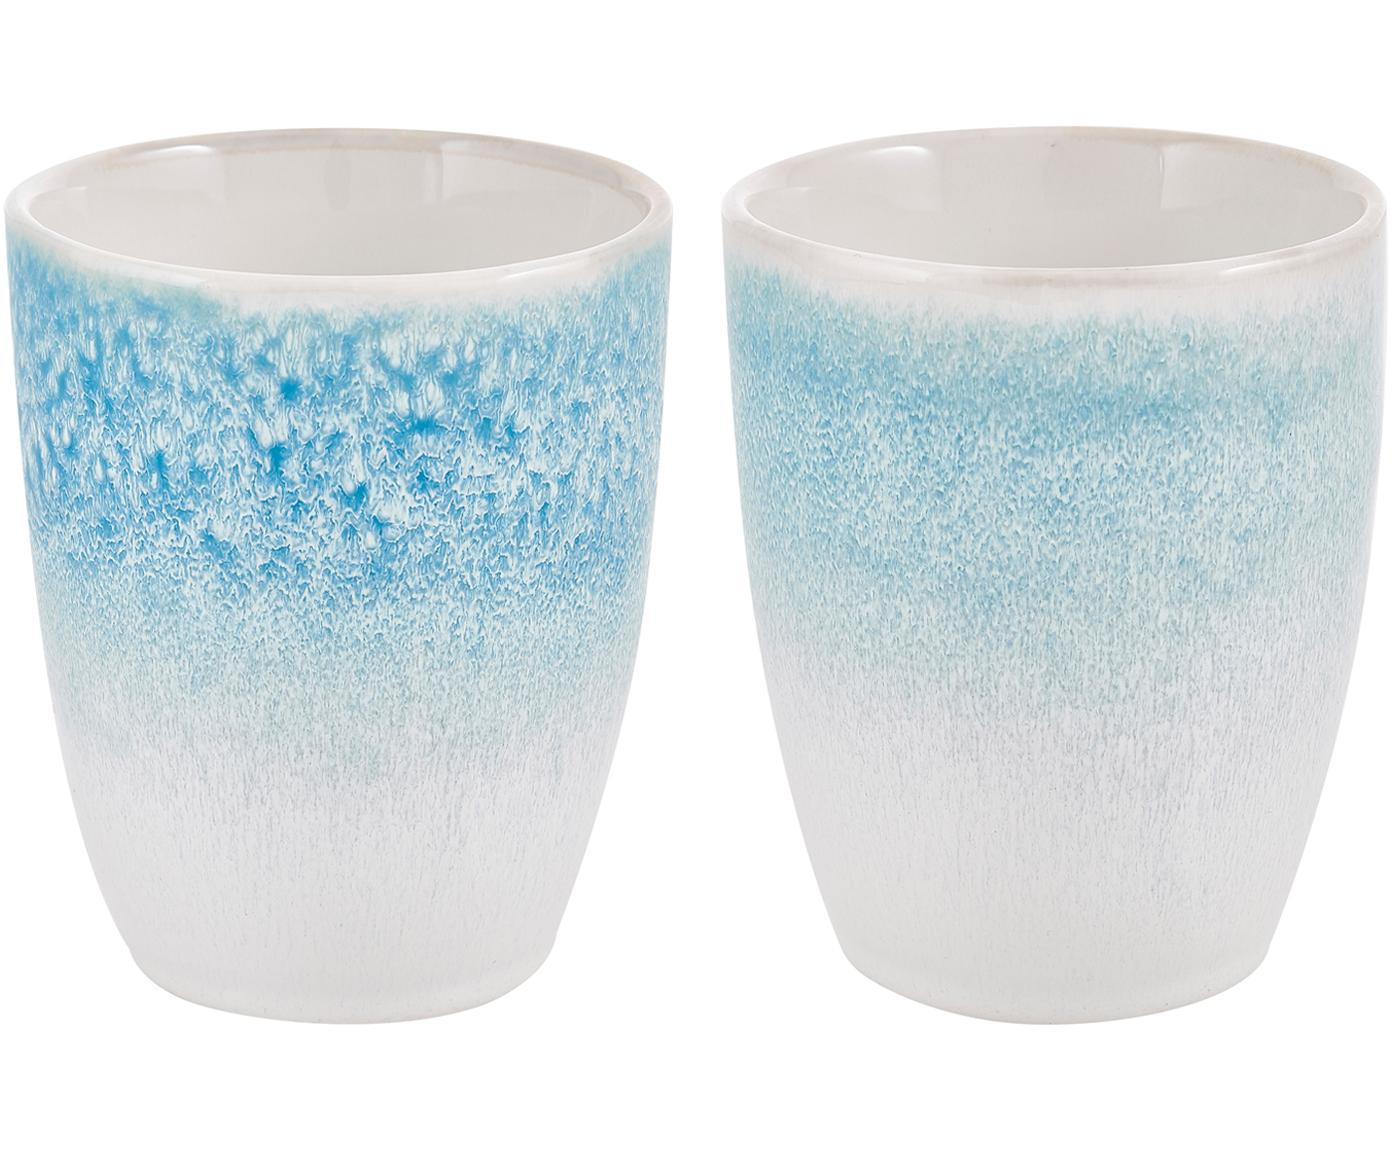 Tazza senza manico fatta a mano Amalia 2 pz, Ceramica, Azzurro, bianco crema, Ø 10 x Alt. 11 cm